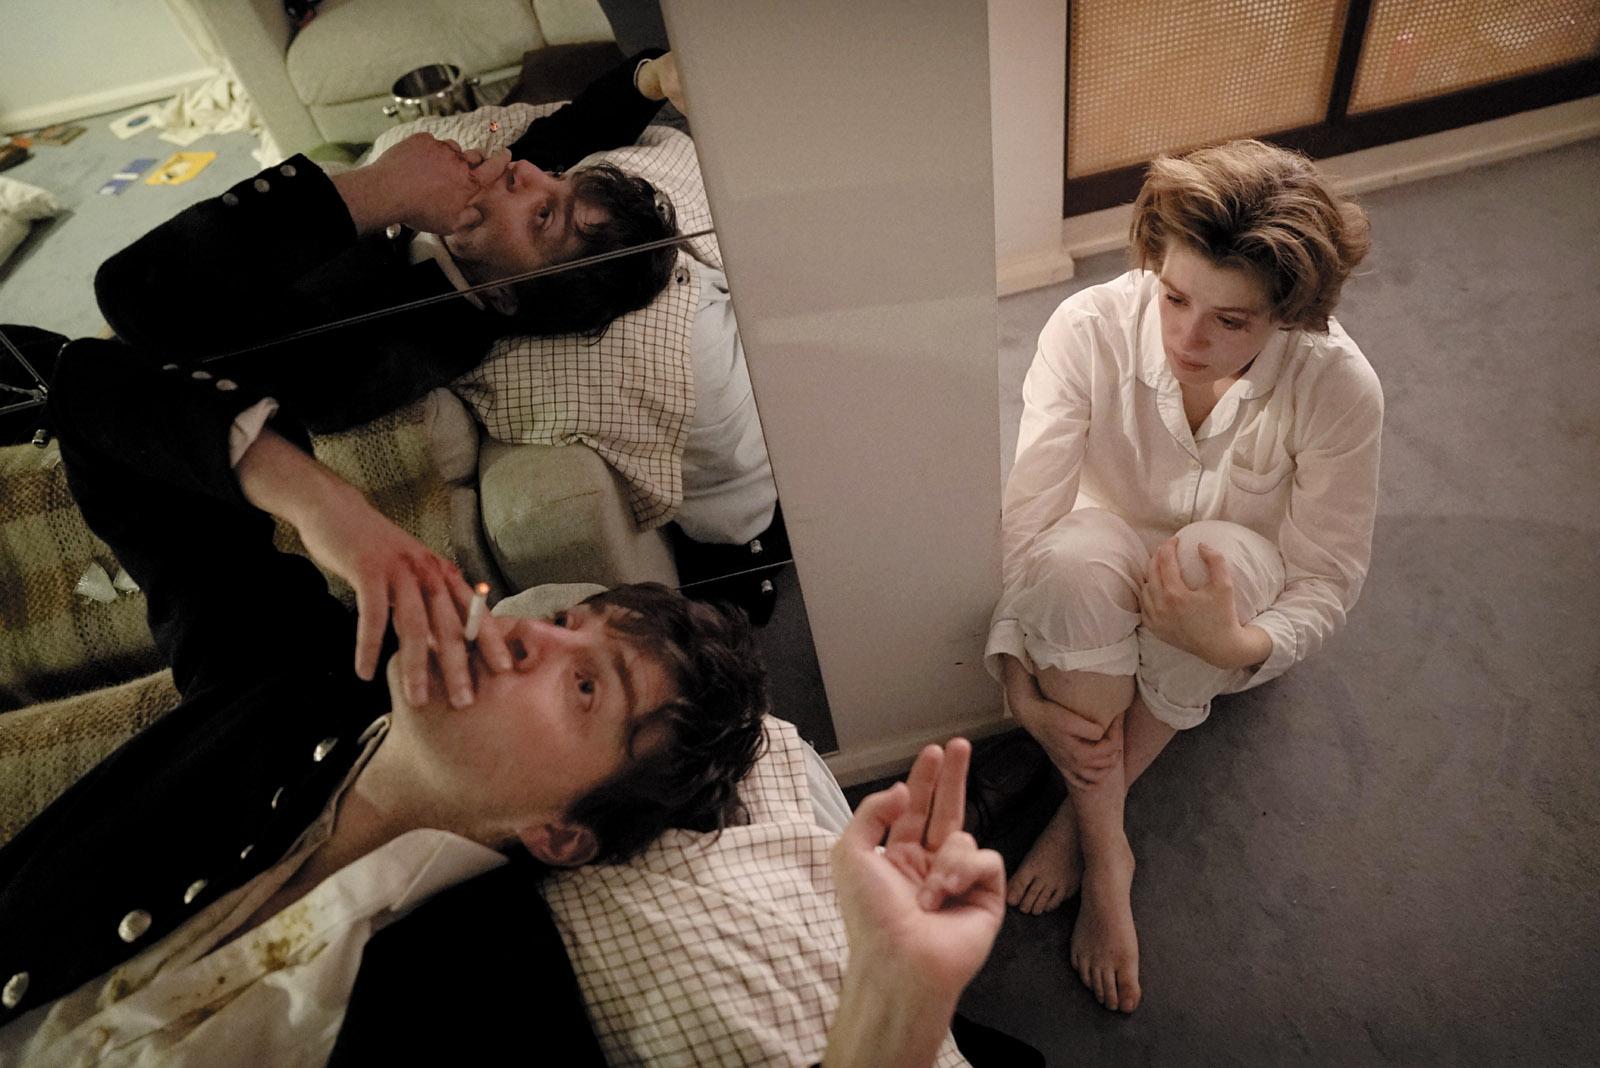 Tom Burke and Honor Swinton Byrne in Joanna Hogg's The Souvenir